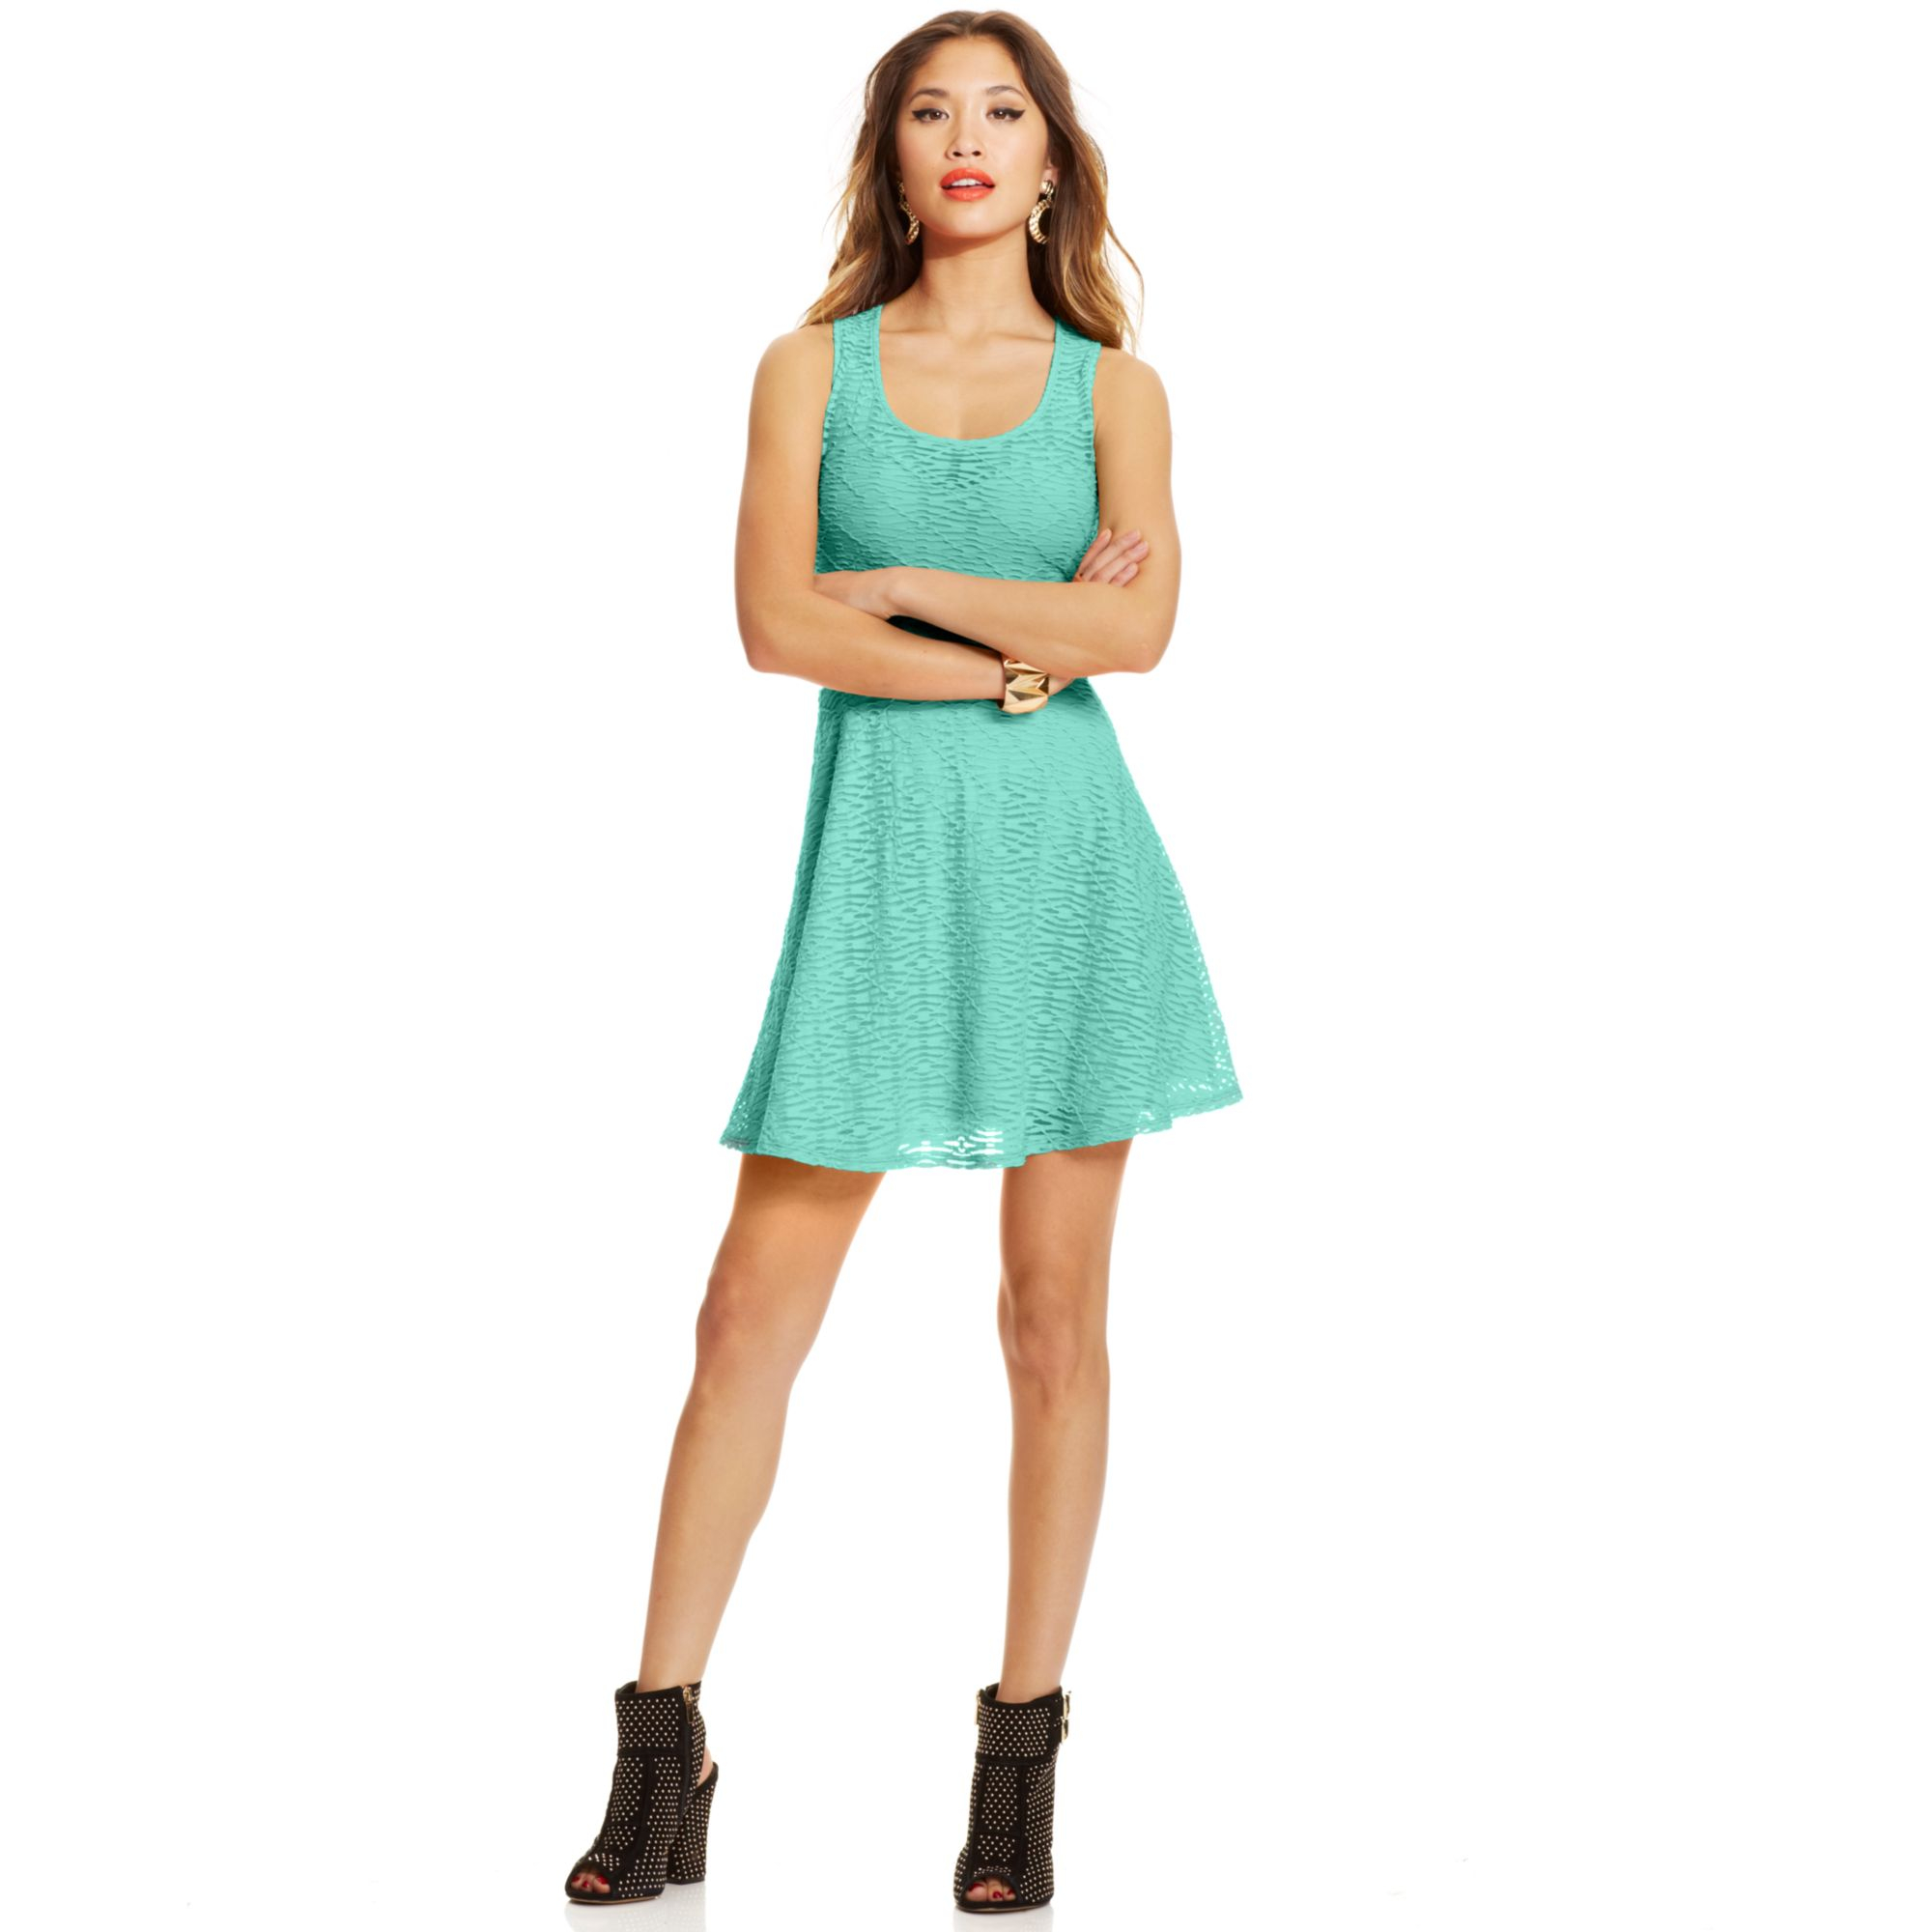 Lyst - Material Girl Juniors Textured Illusion Skater Dress in Green